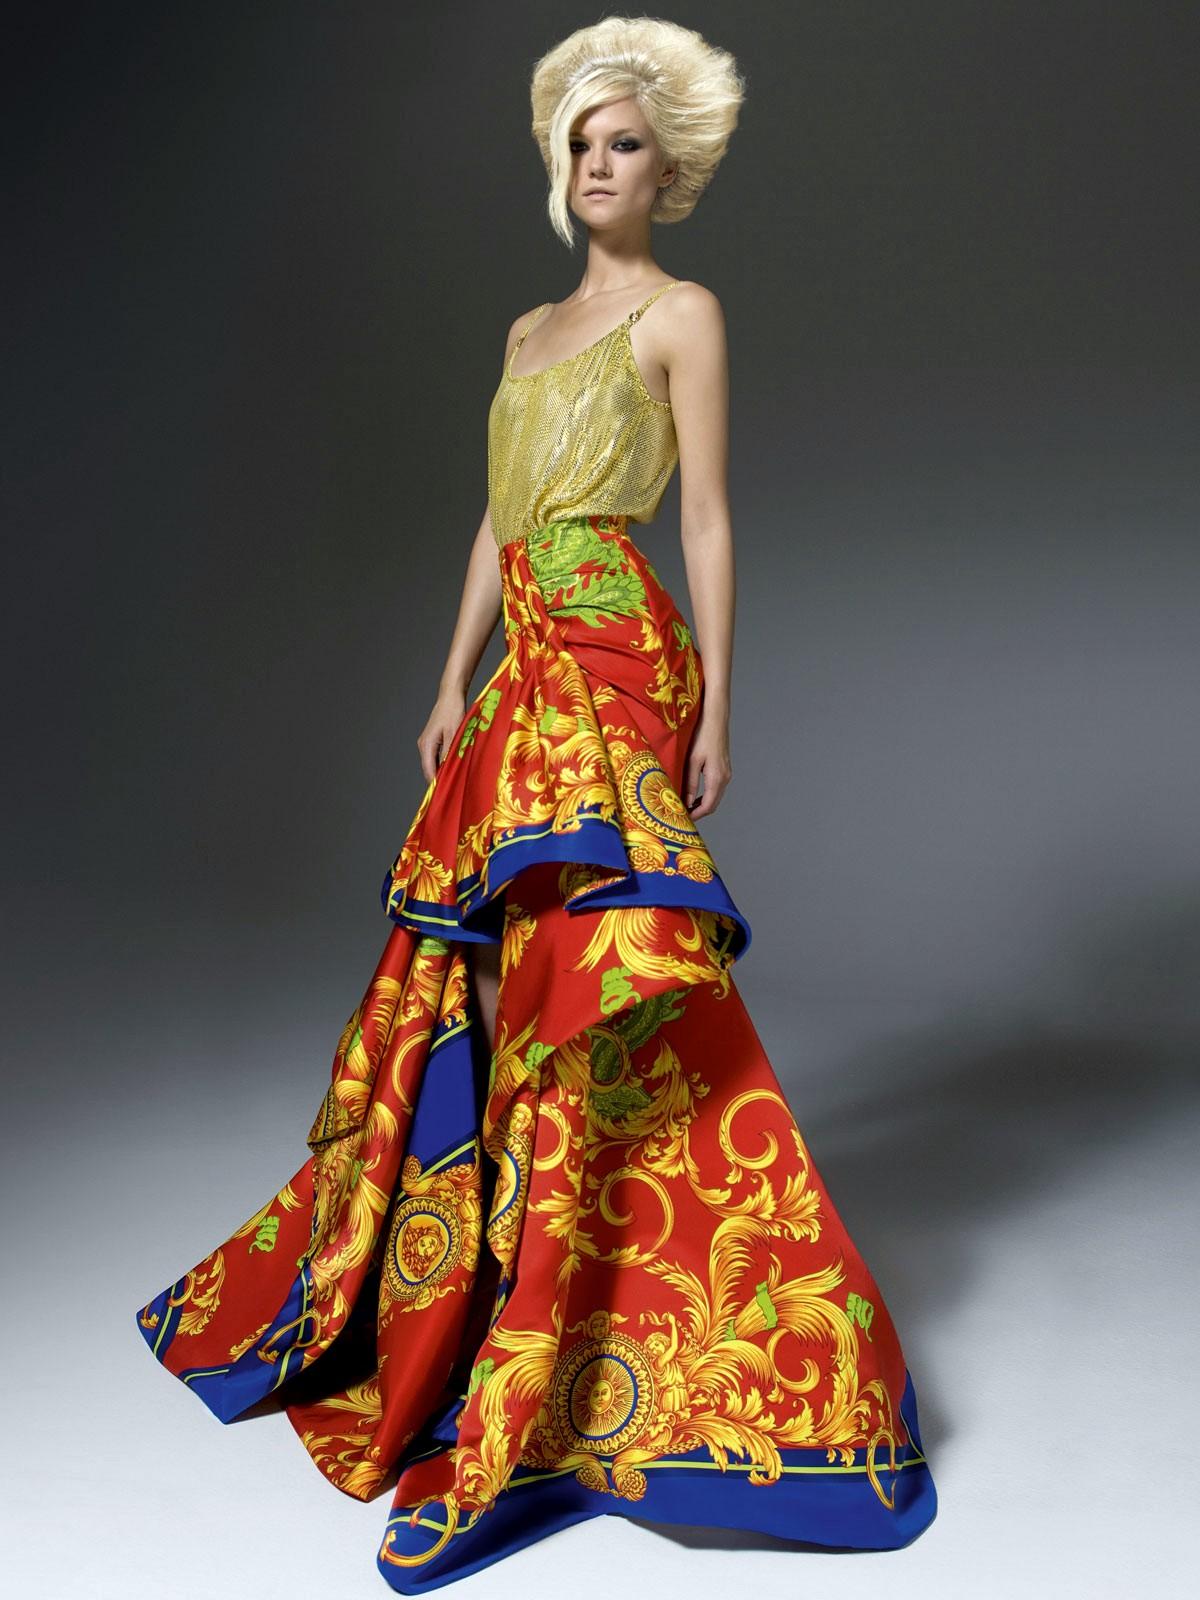 Versace Latest Clothing Men Women Trends for ladies Dresses (4)